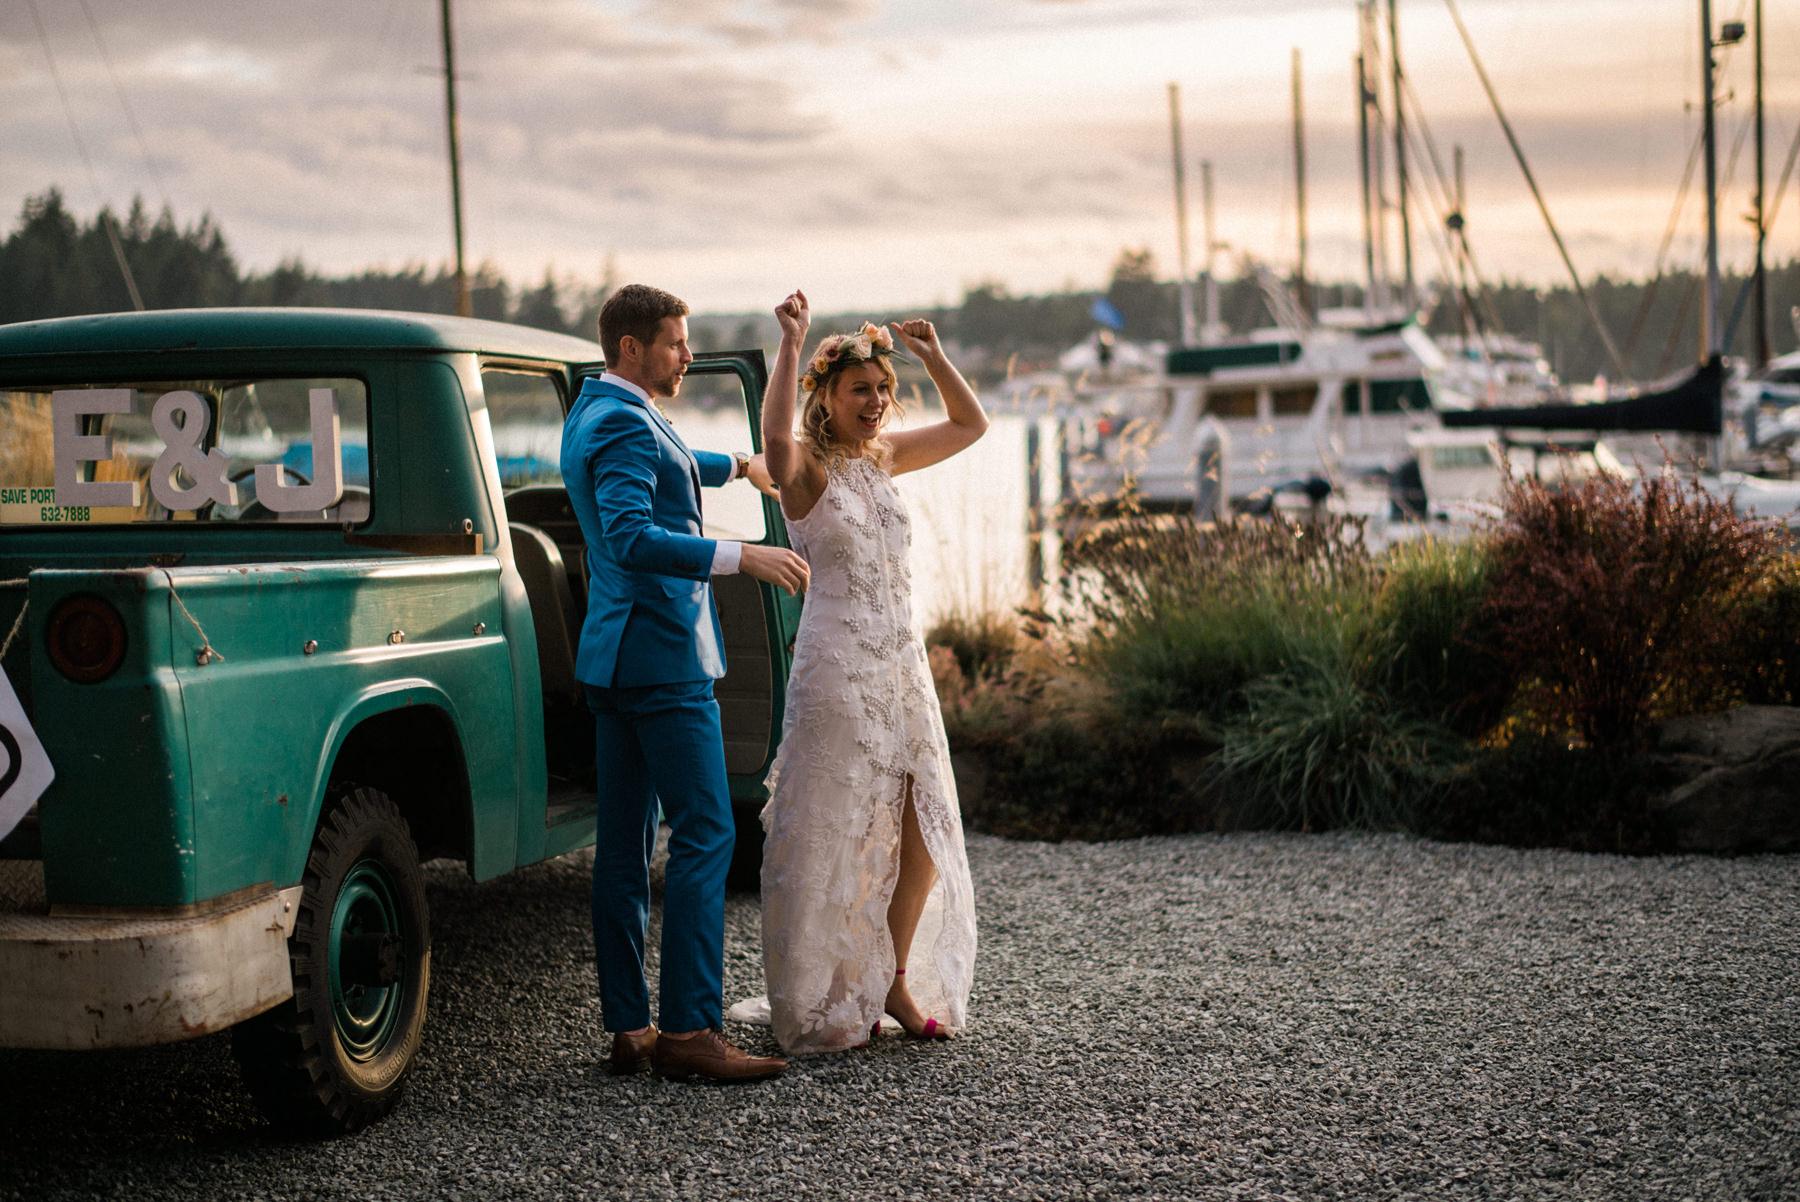 360-colorful-outdoor-lopez-island-wedding.jpg